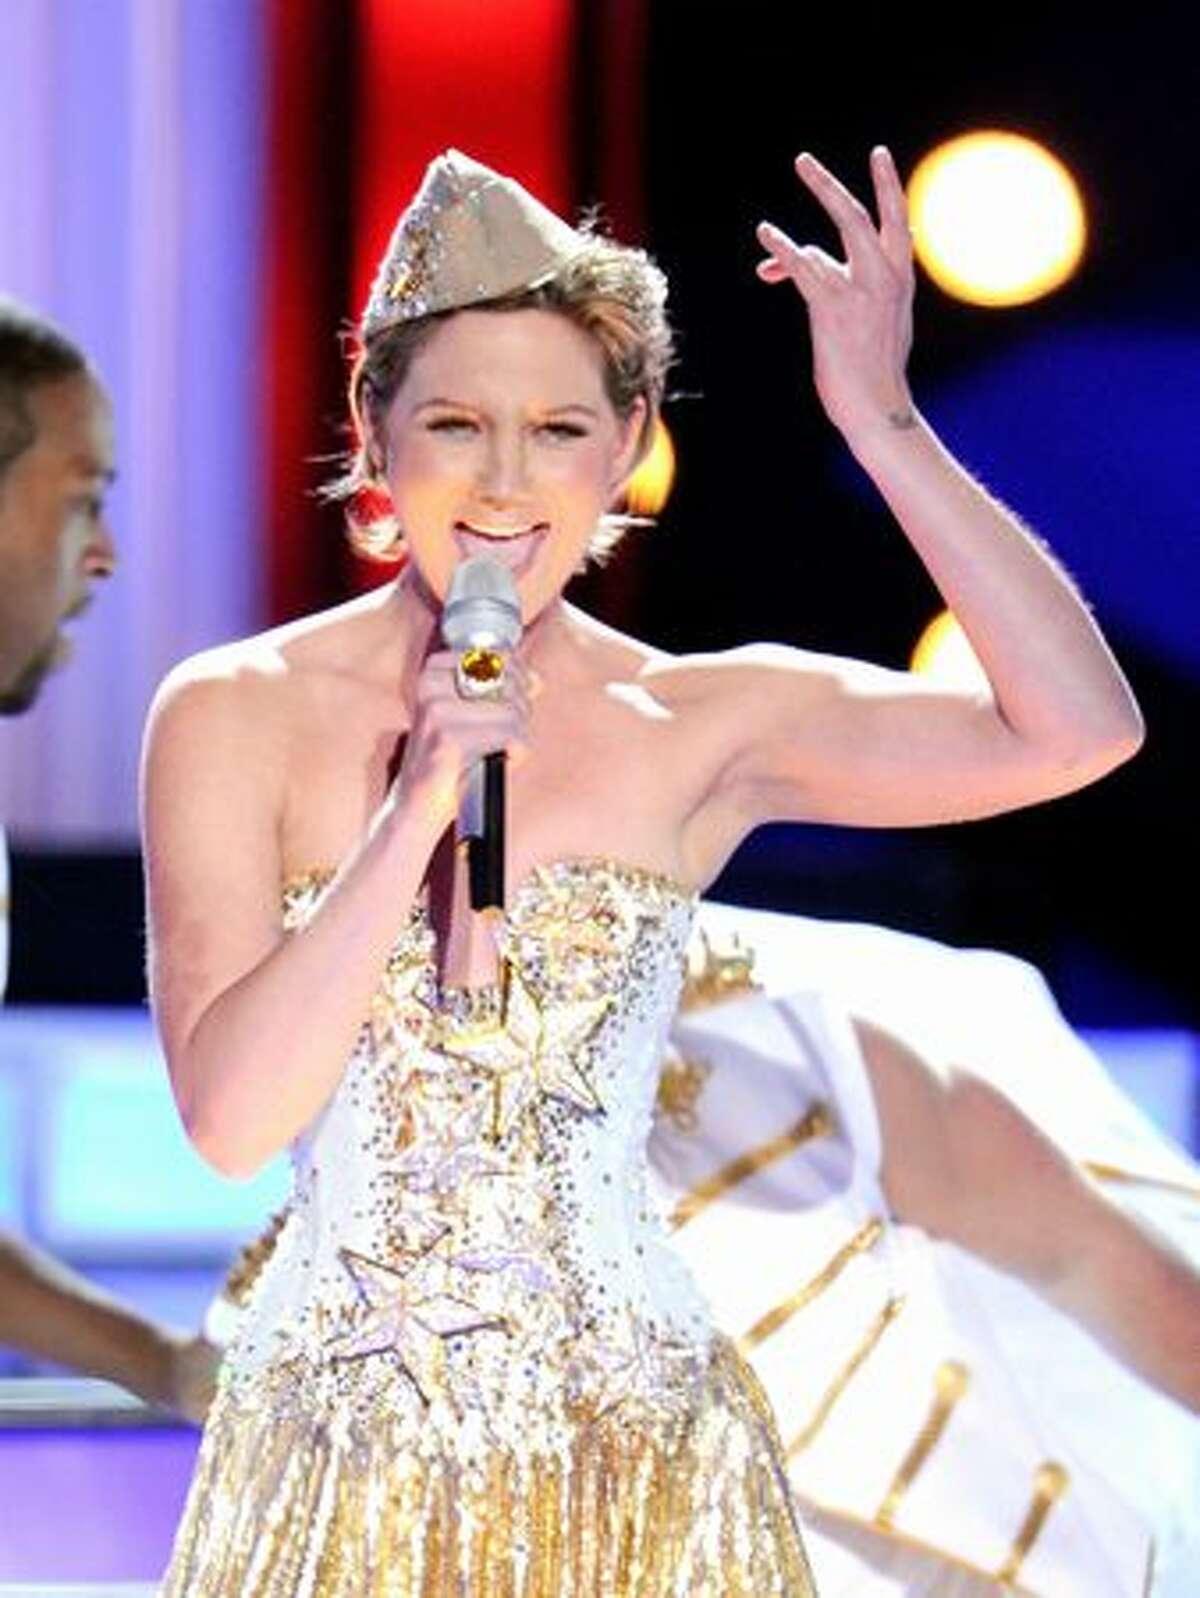 Singer Jennifer Nettles performs onstage.